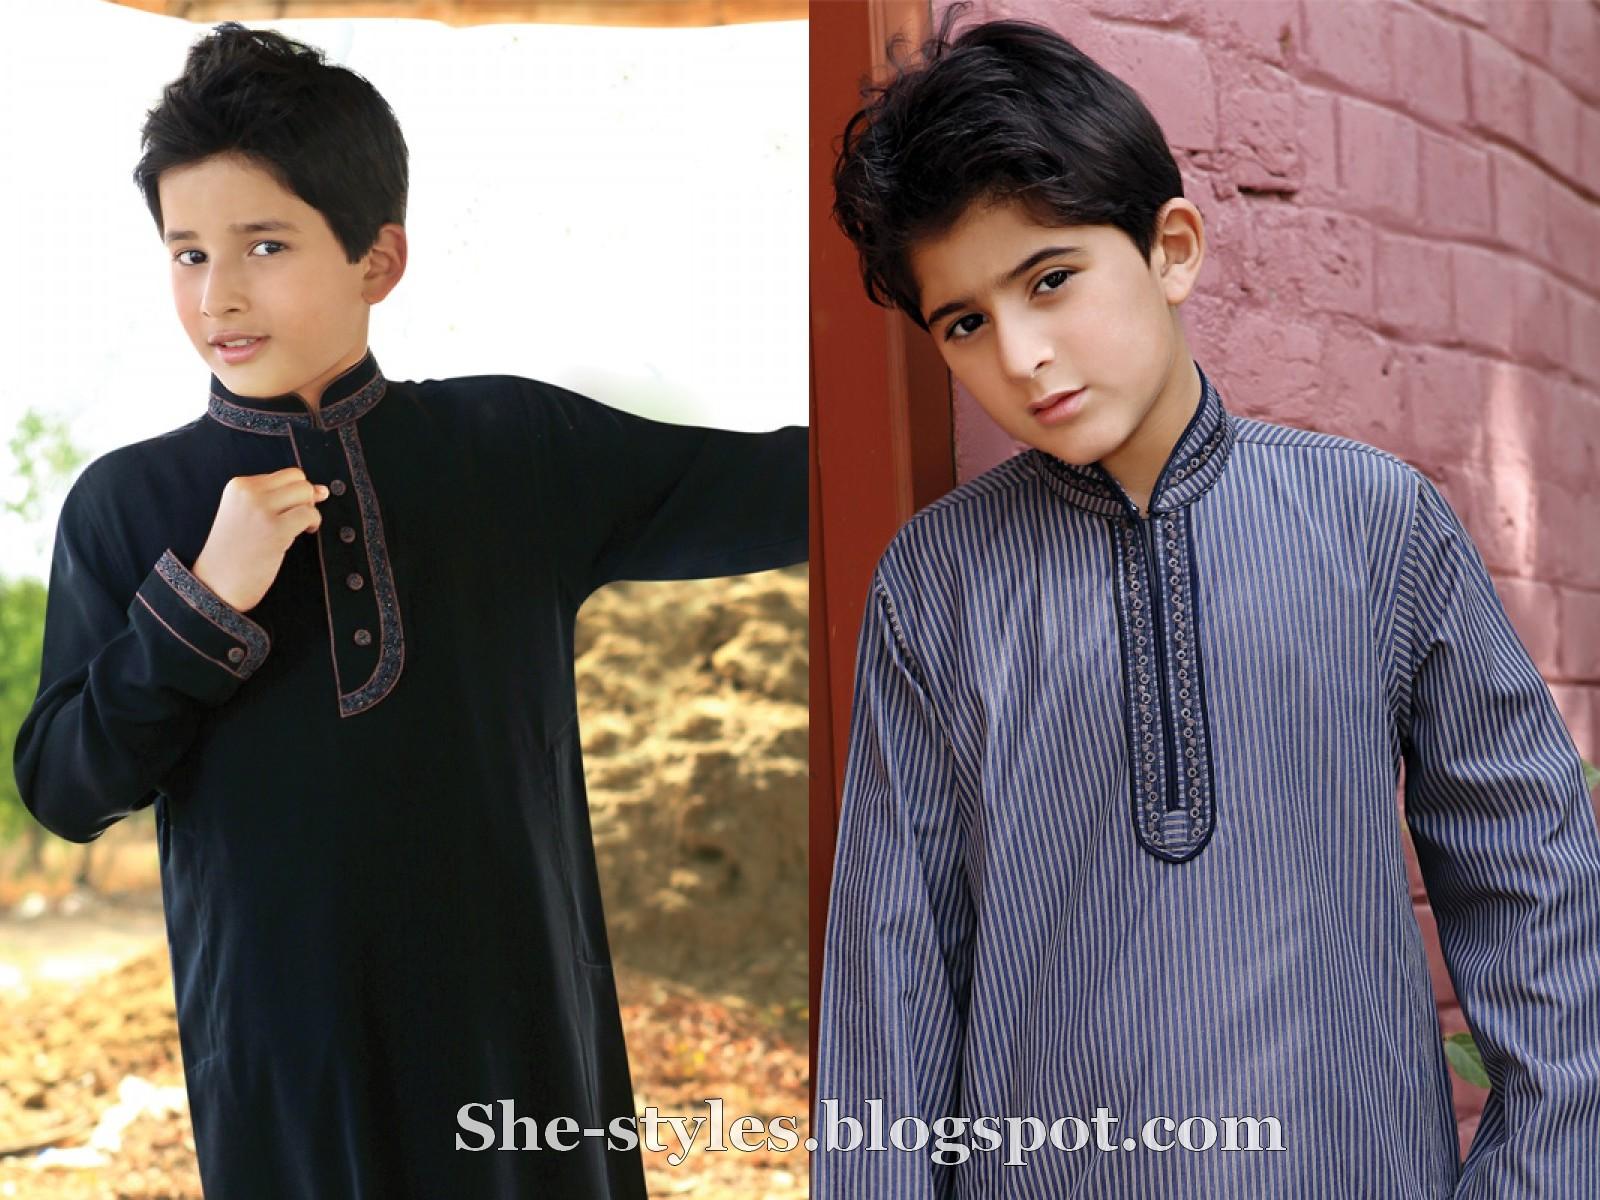 Eid kids kurta shalwar kameez designs 2013 2014 - Eden Robe Kids Shalwar Kameez New Arrivals 2012 Eden Robe Boys Kurta